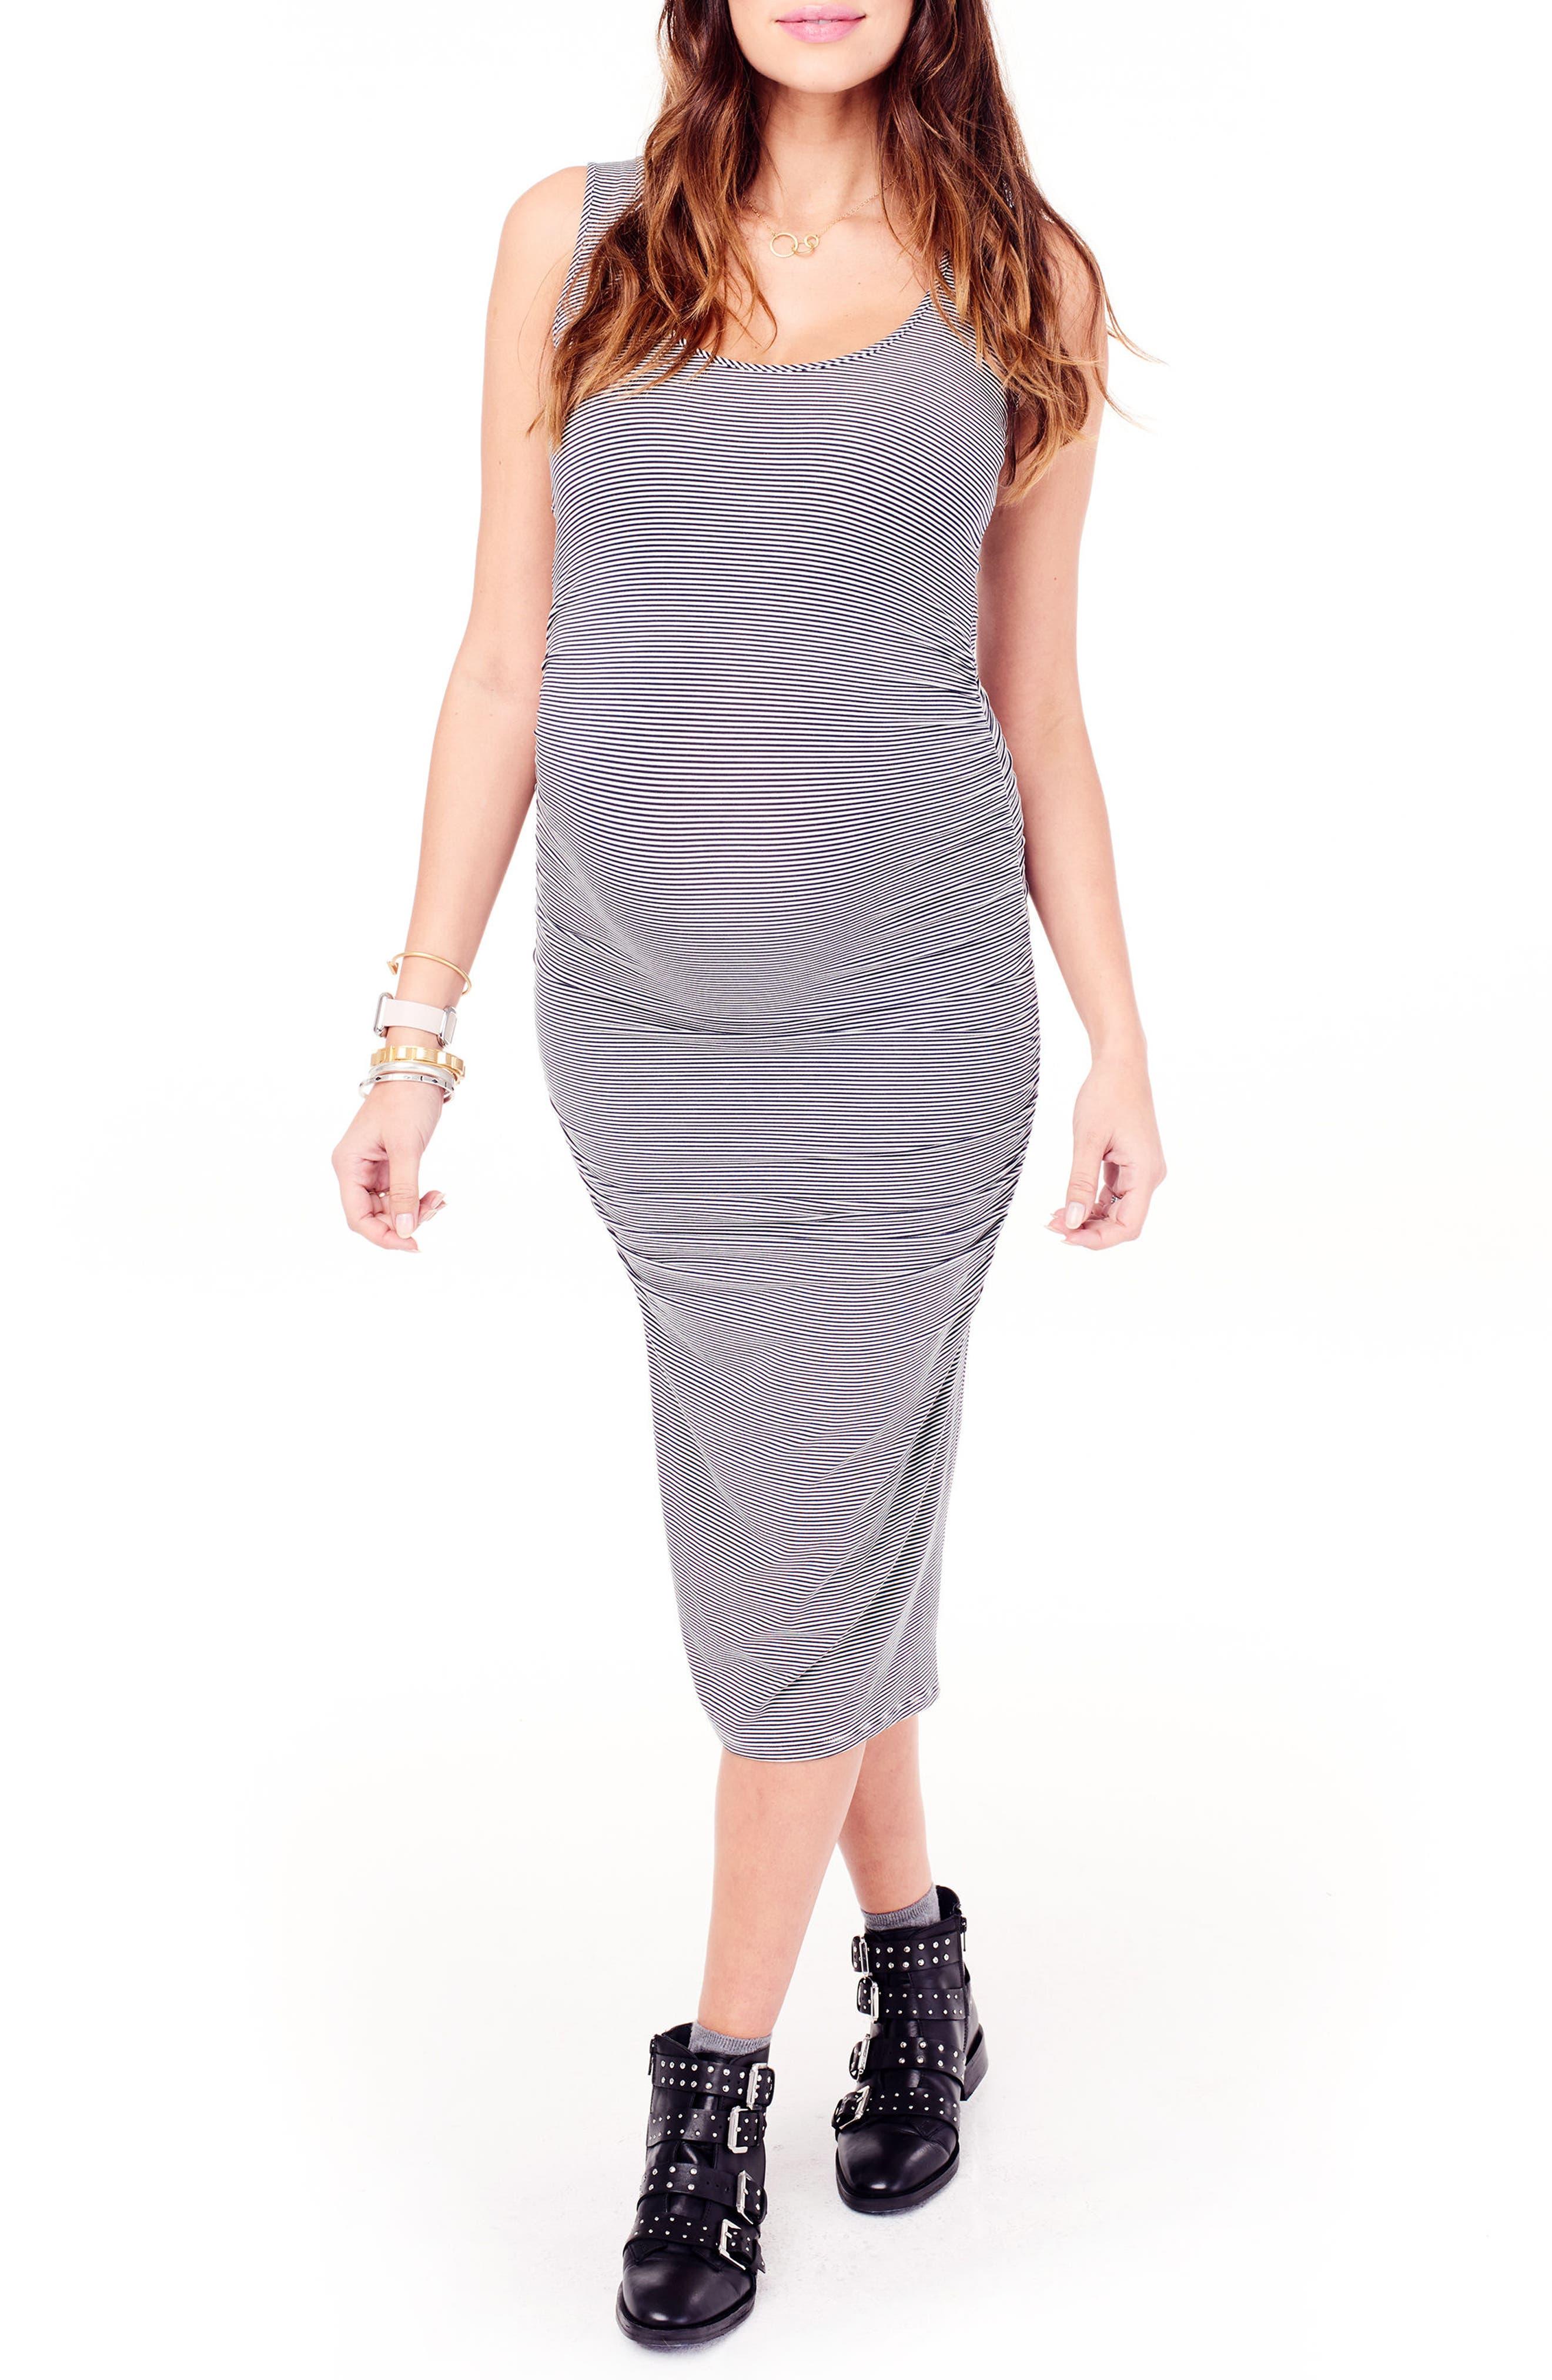 Shirred Midi Maternity Tank Dress,                         Main,                         color, TRUE NAVY/ IVORY MICROSTRIPE